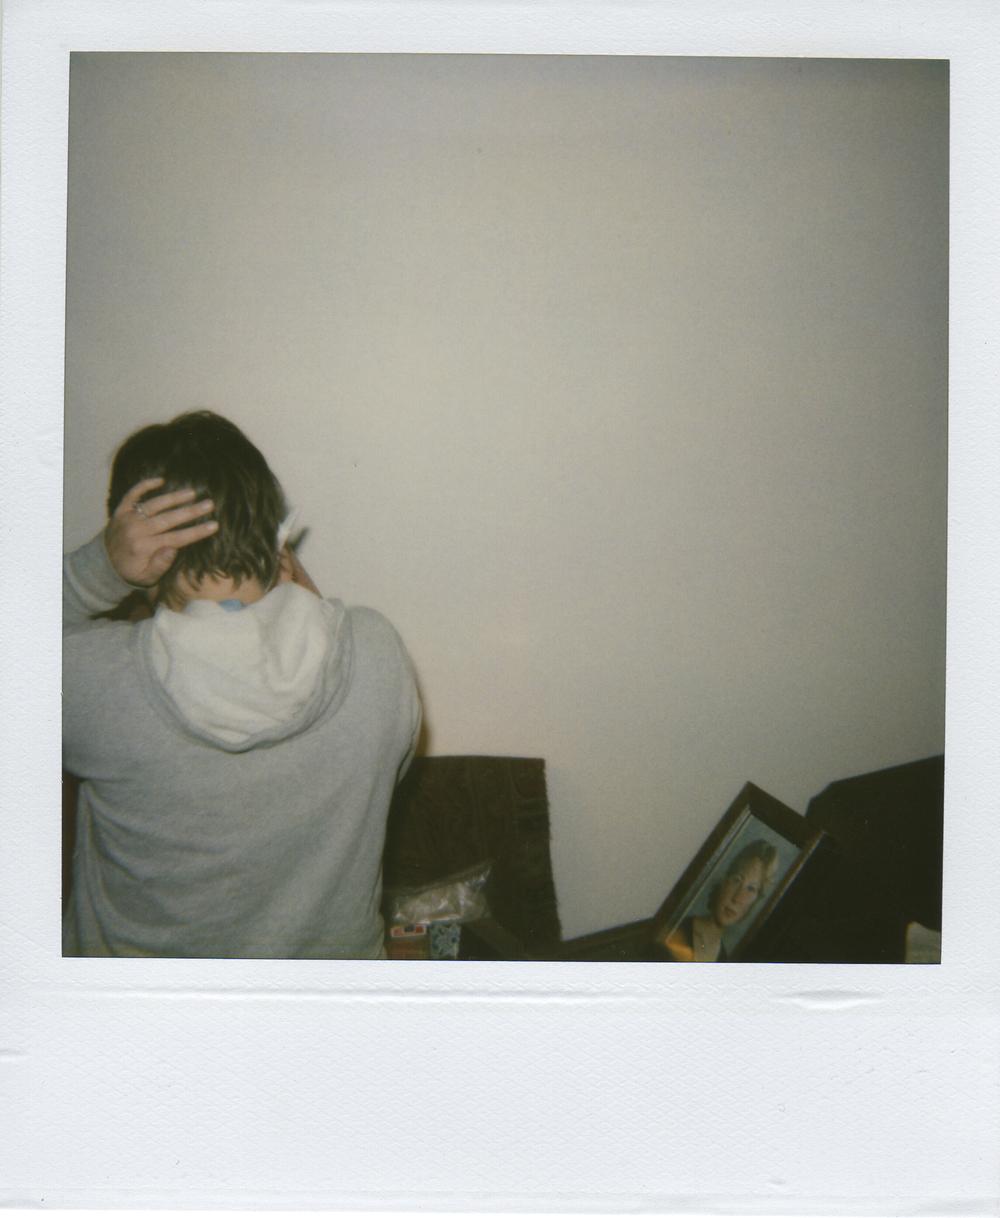 jlaurence-polaroid-088.jpg